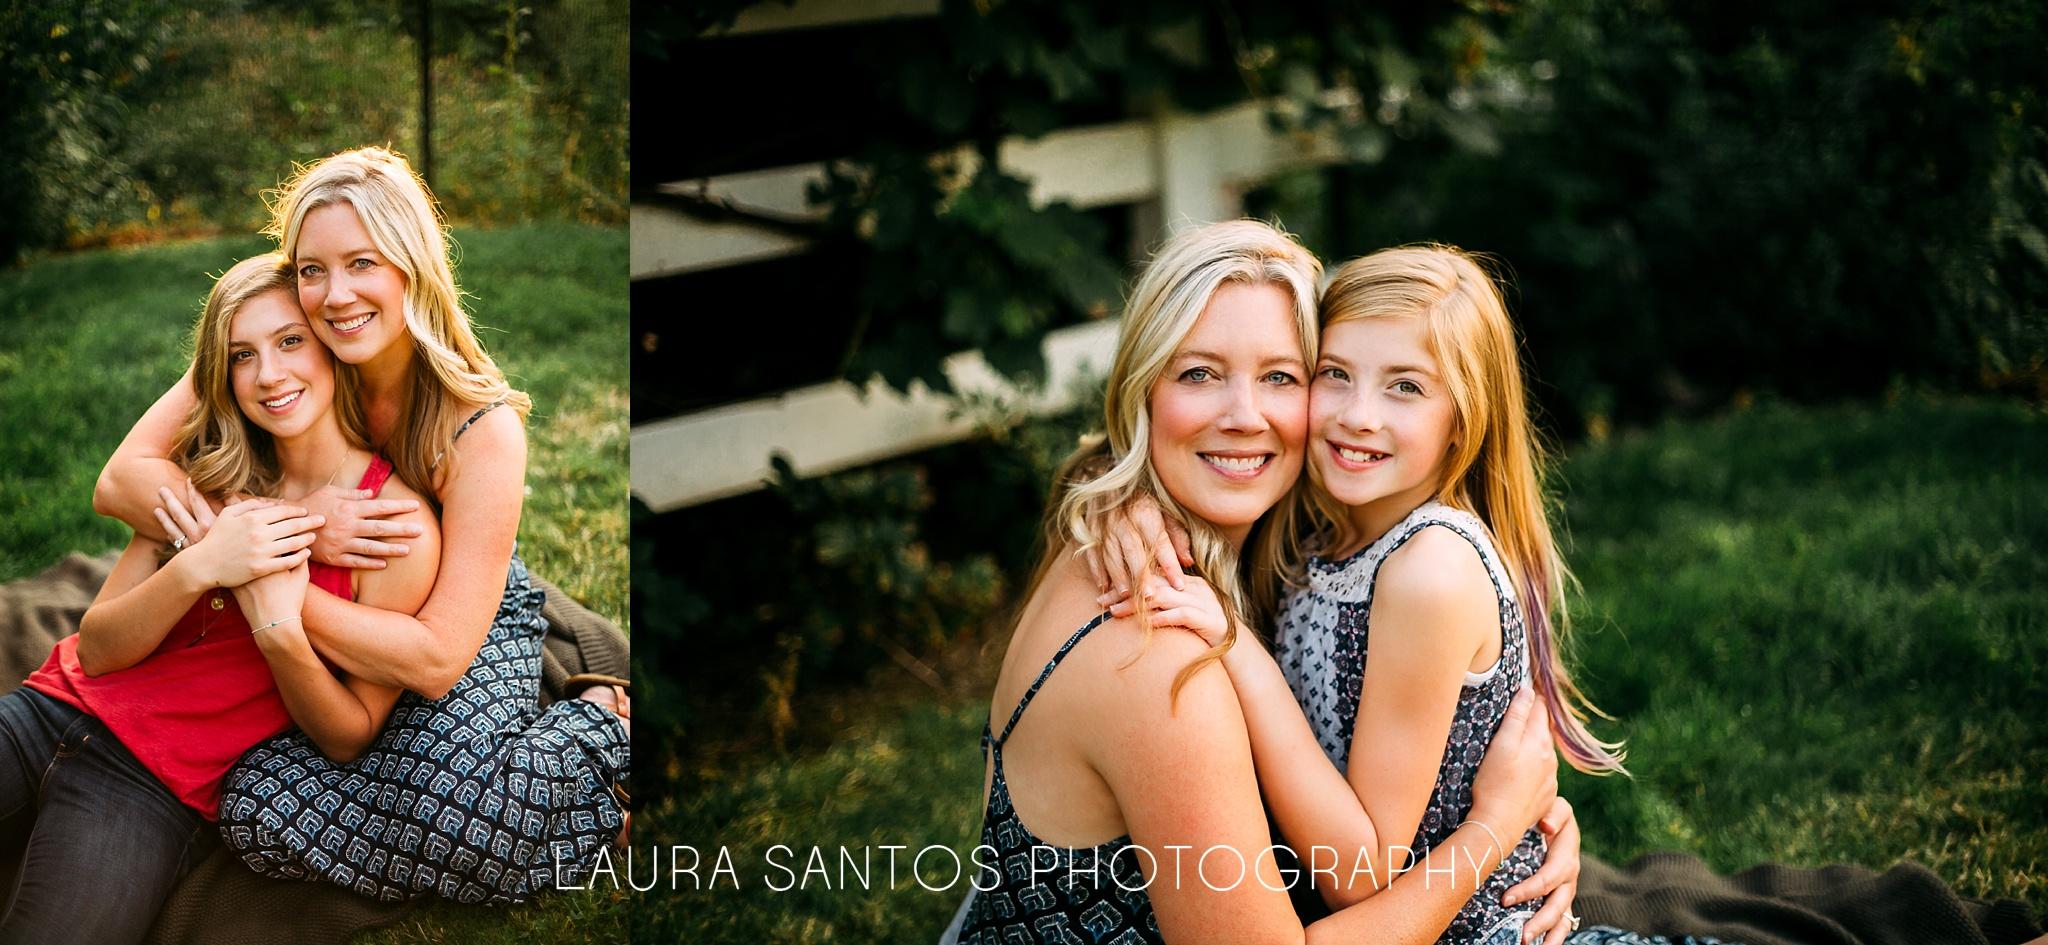 Laura Santos Photography Portland Oregon Family Photographer_0216.jpg